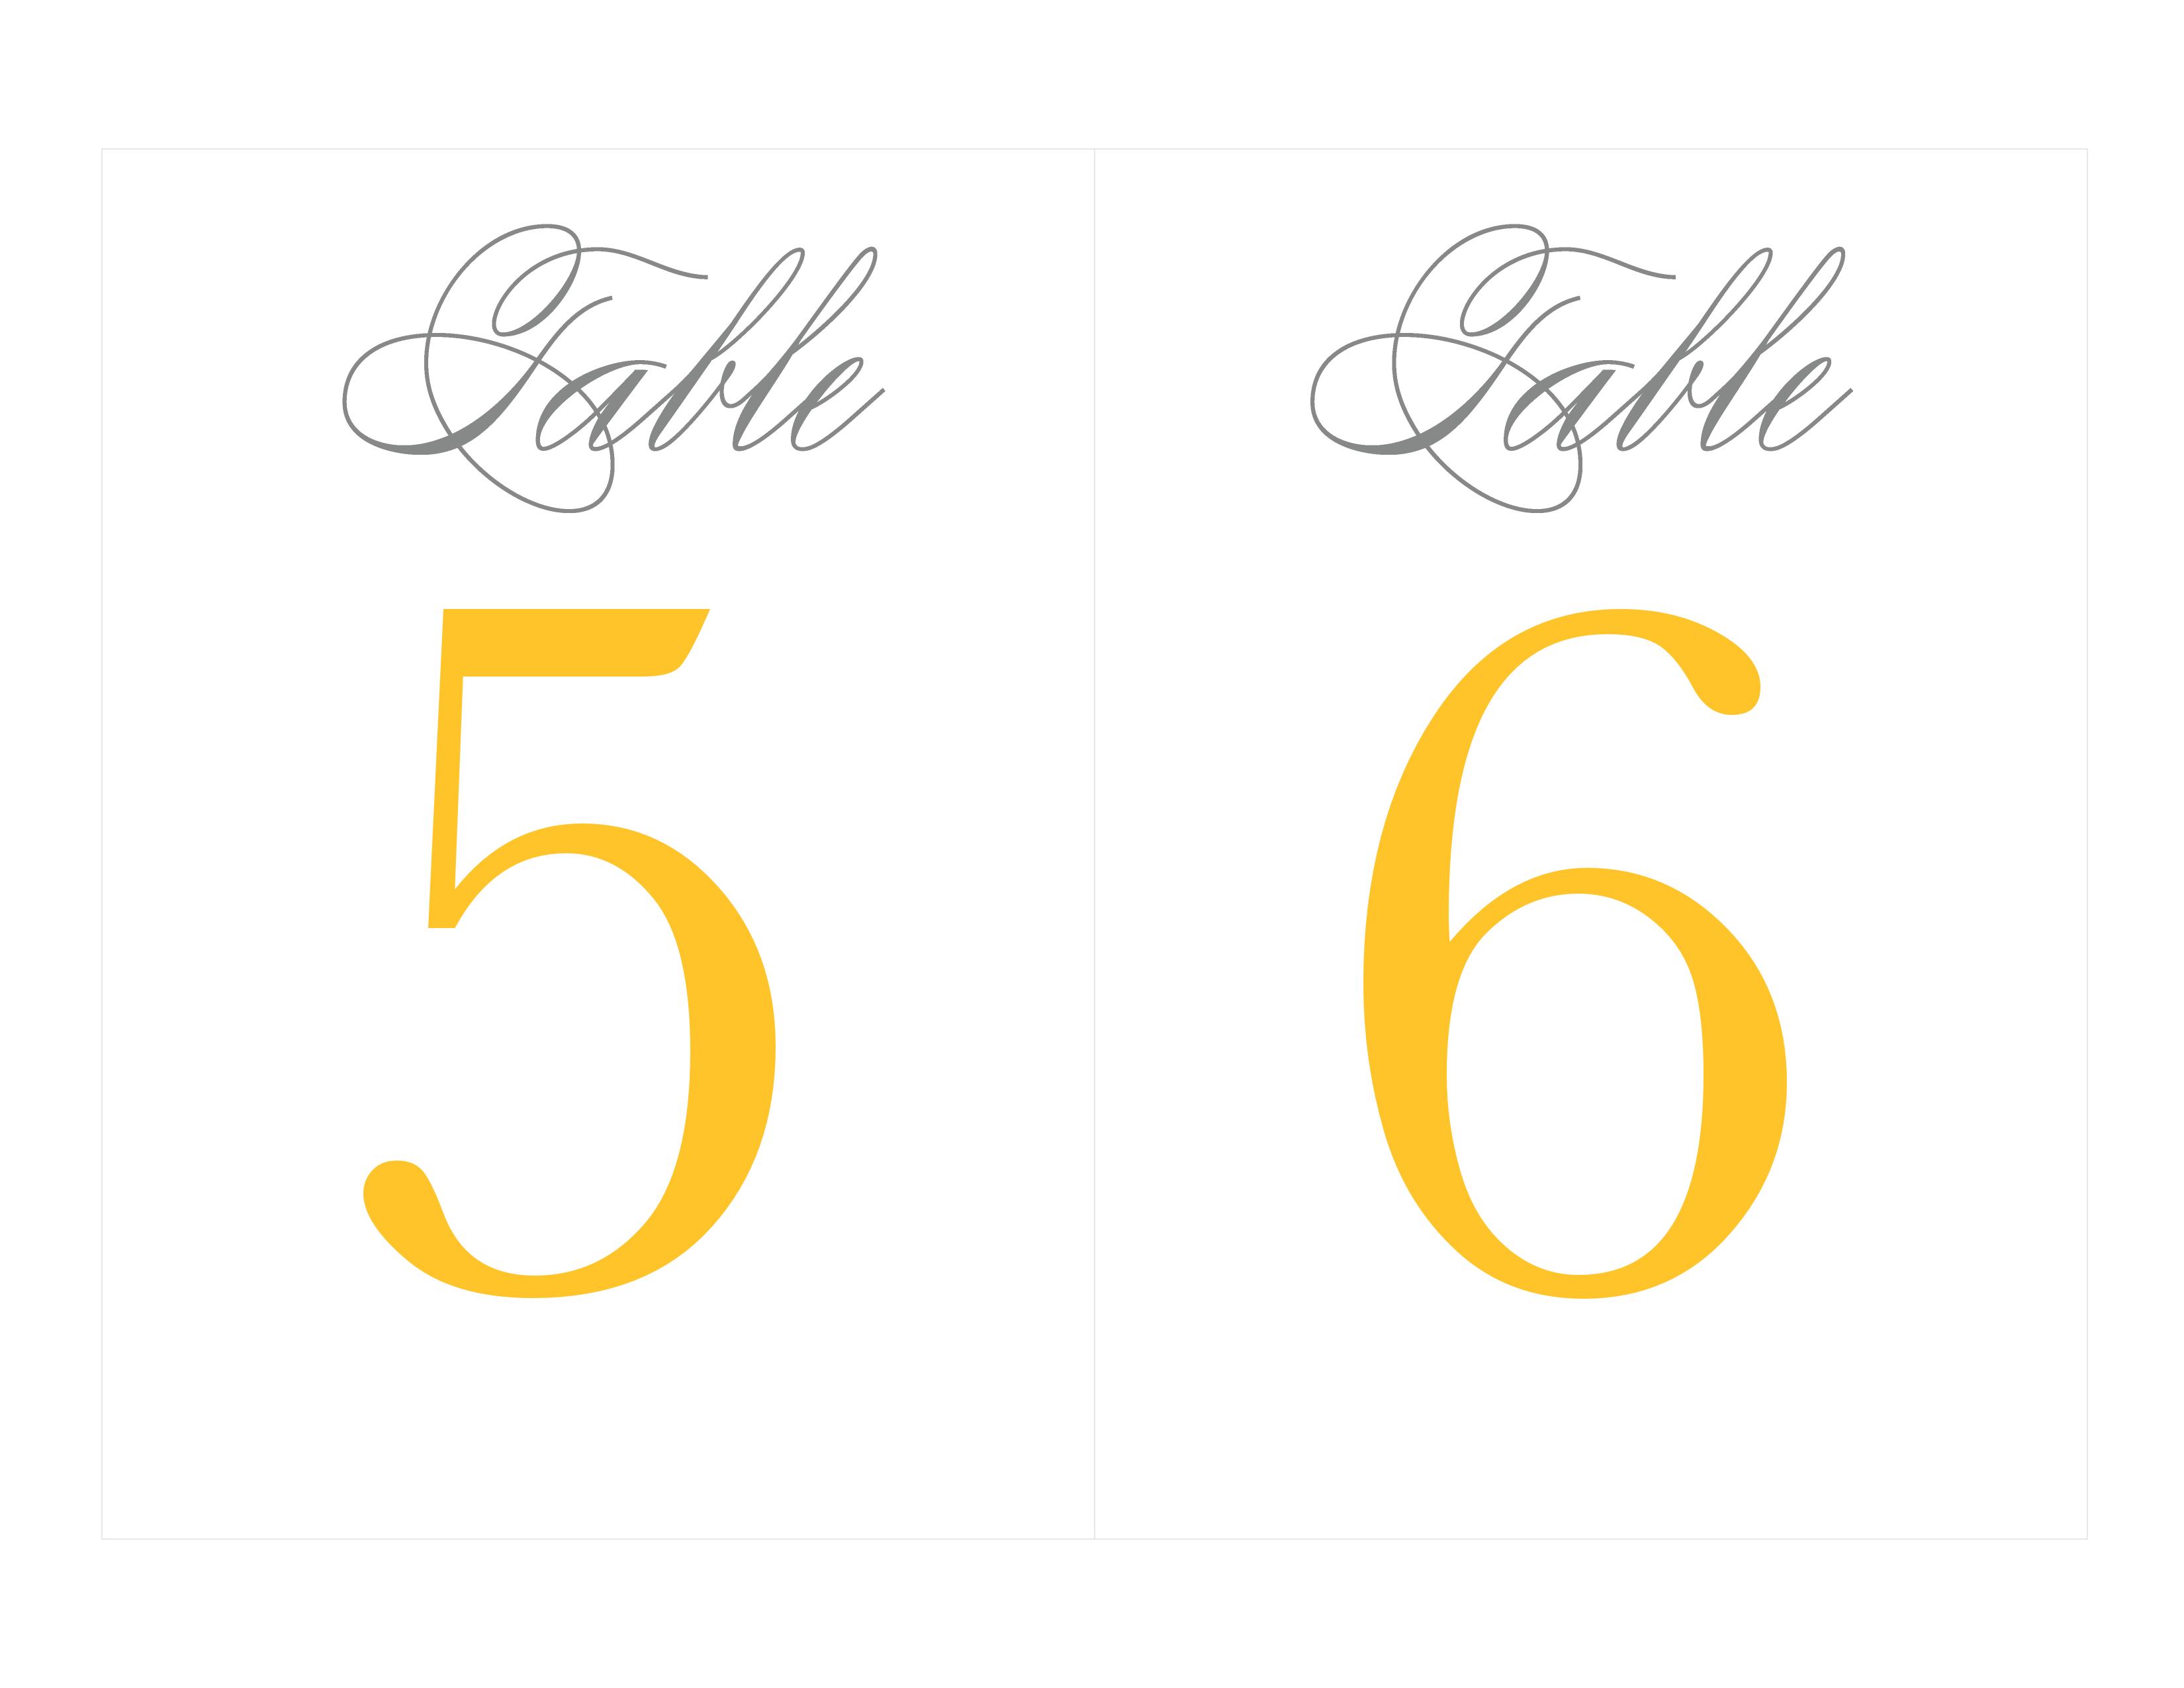 Free Printable Table Numbers | Wedding Ideas - Grey & Yellow - Free Printable Table Numbers